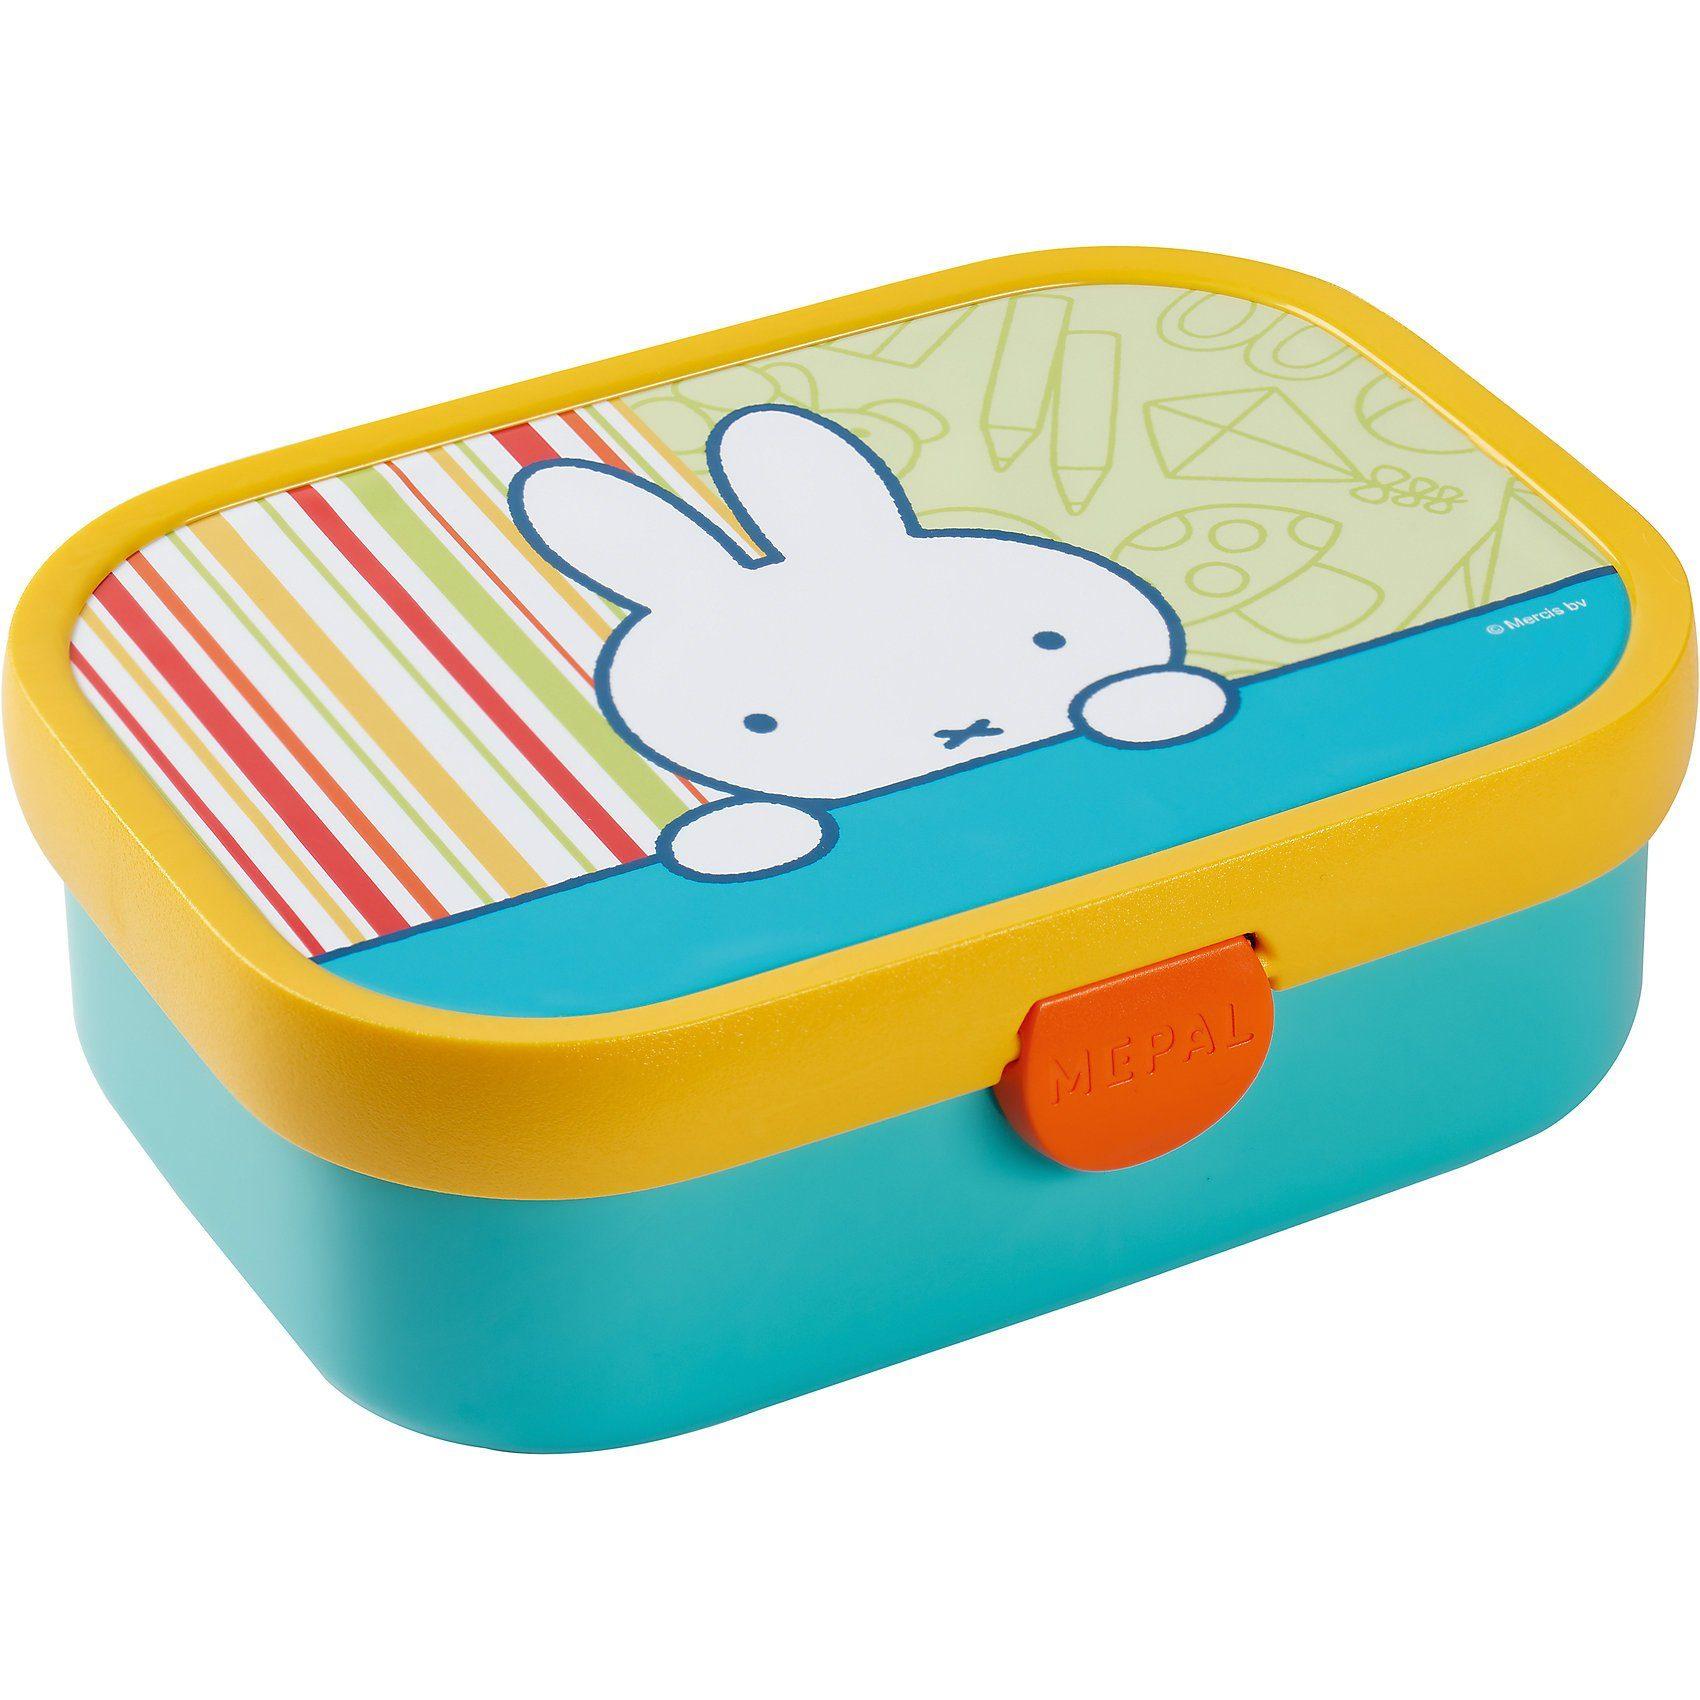 NEU Spielware Miffy Lunchbox